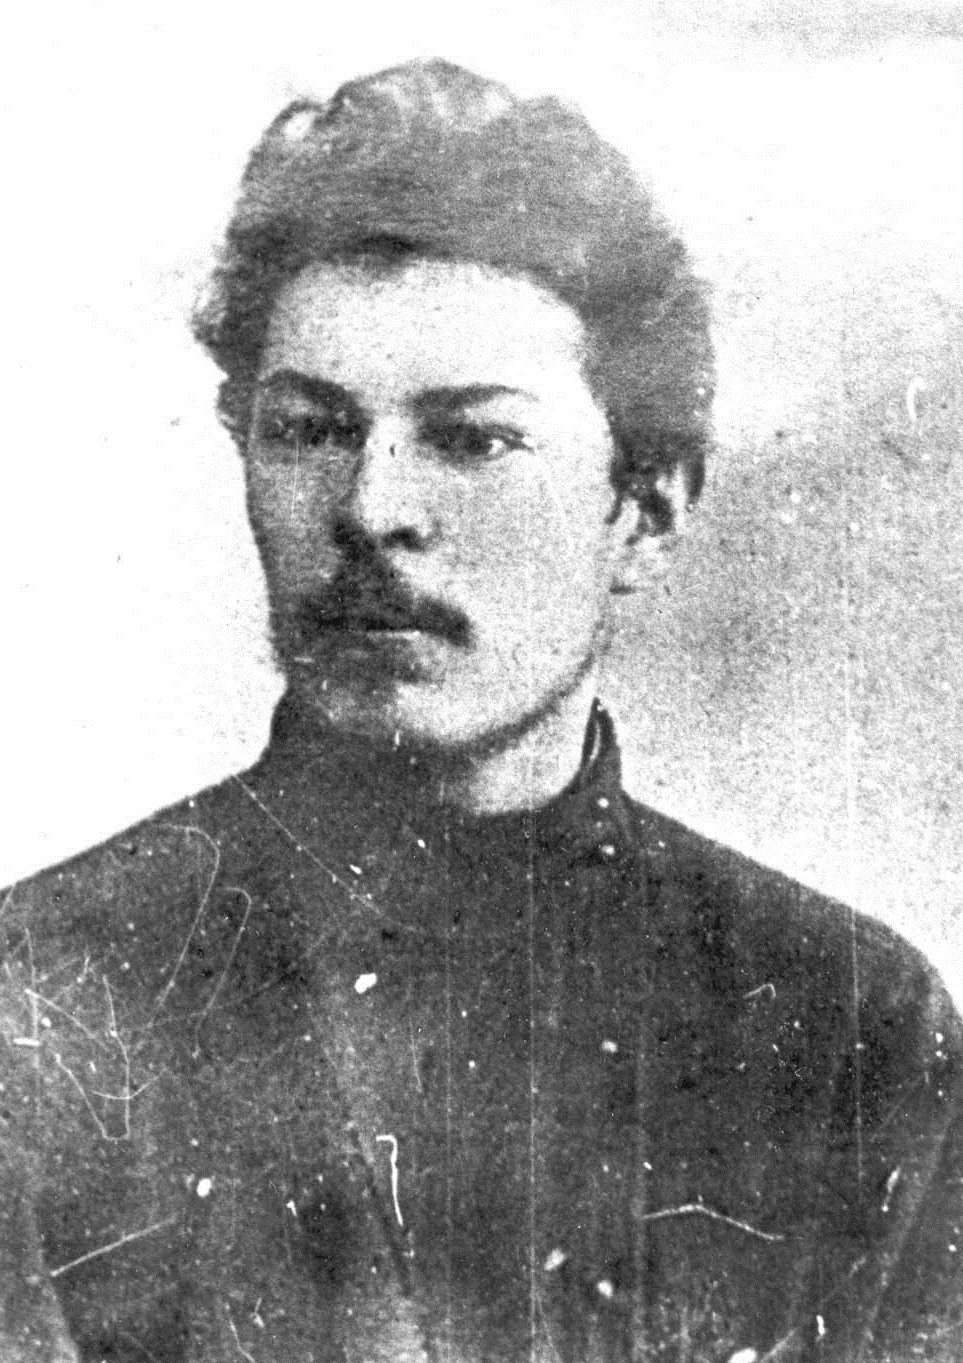 ПКонстантин Попов в 1905 году.